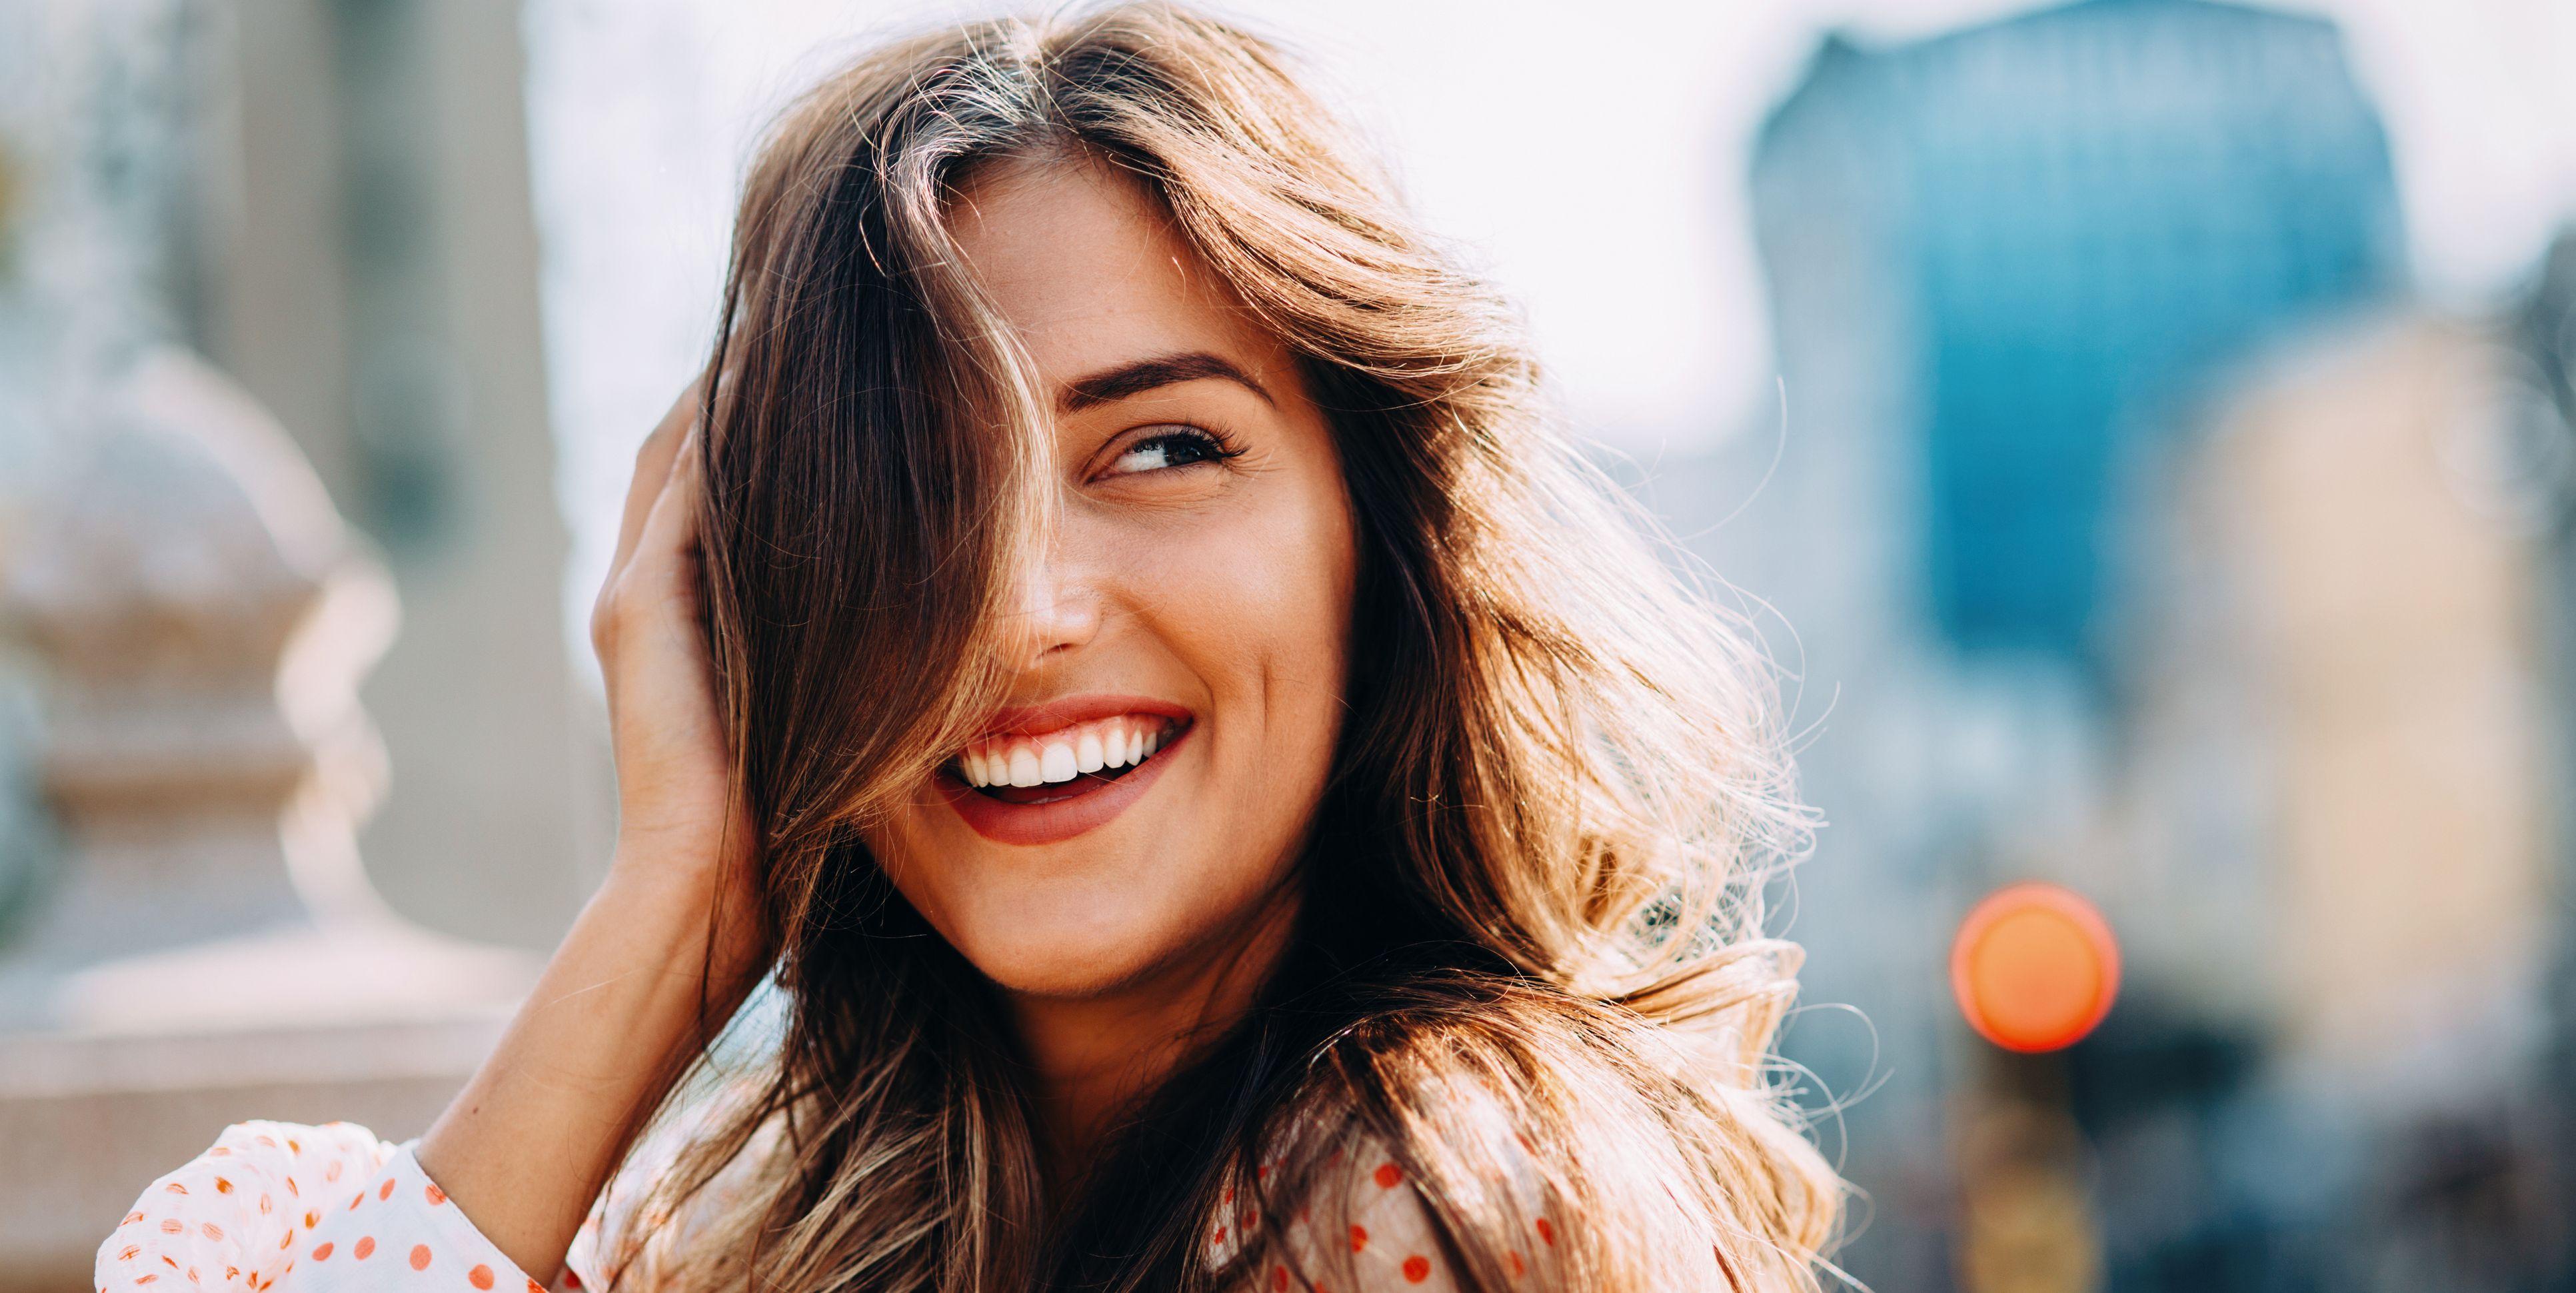 Happy woman